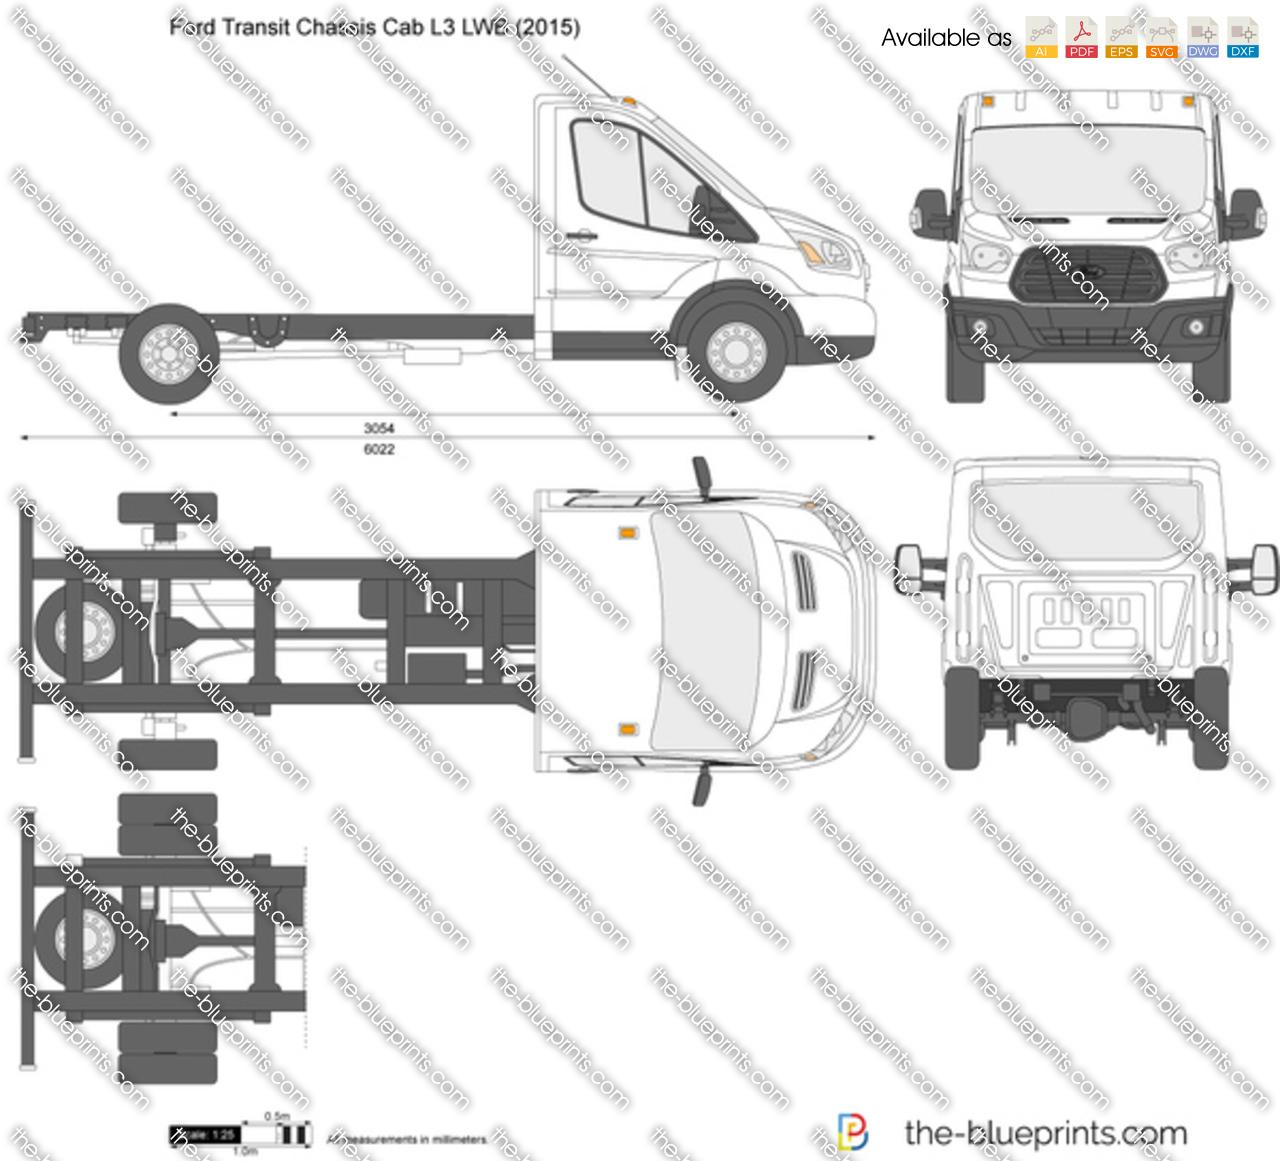 Ford Transit Chassis Cab L3 LWB